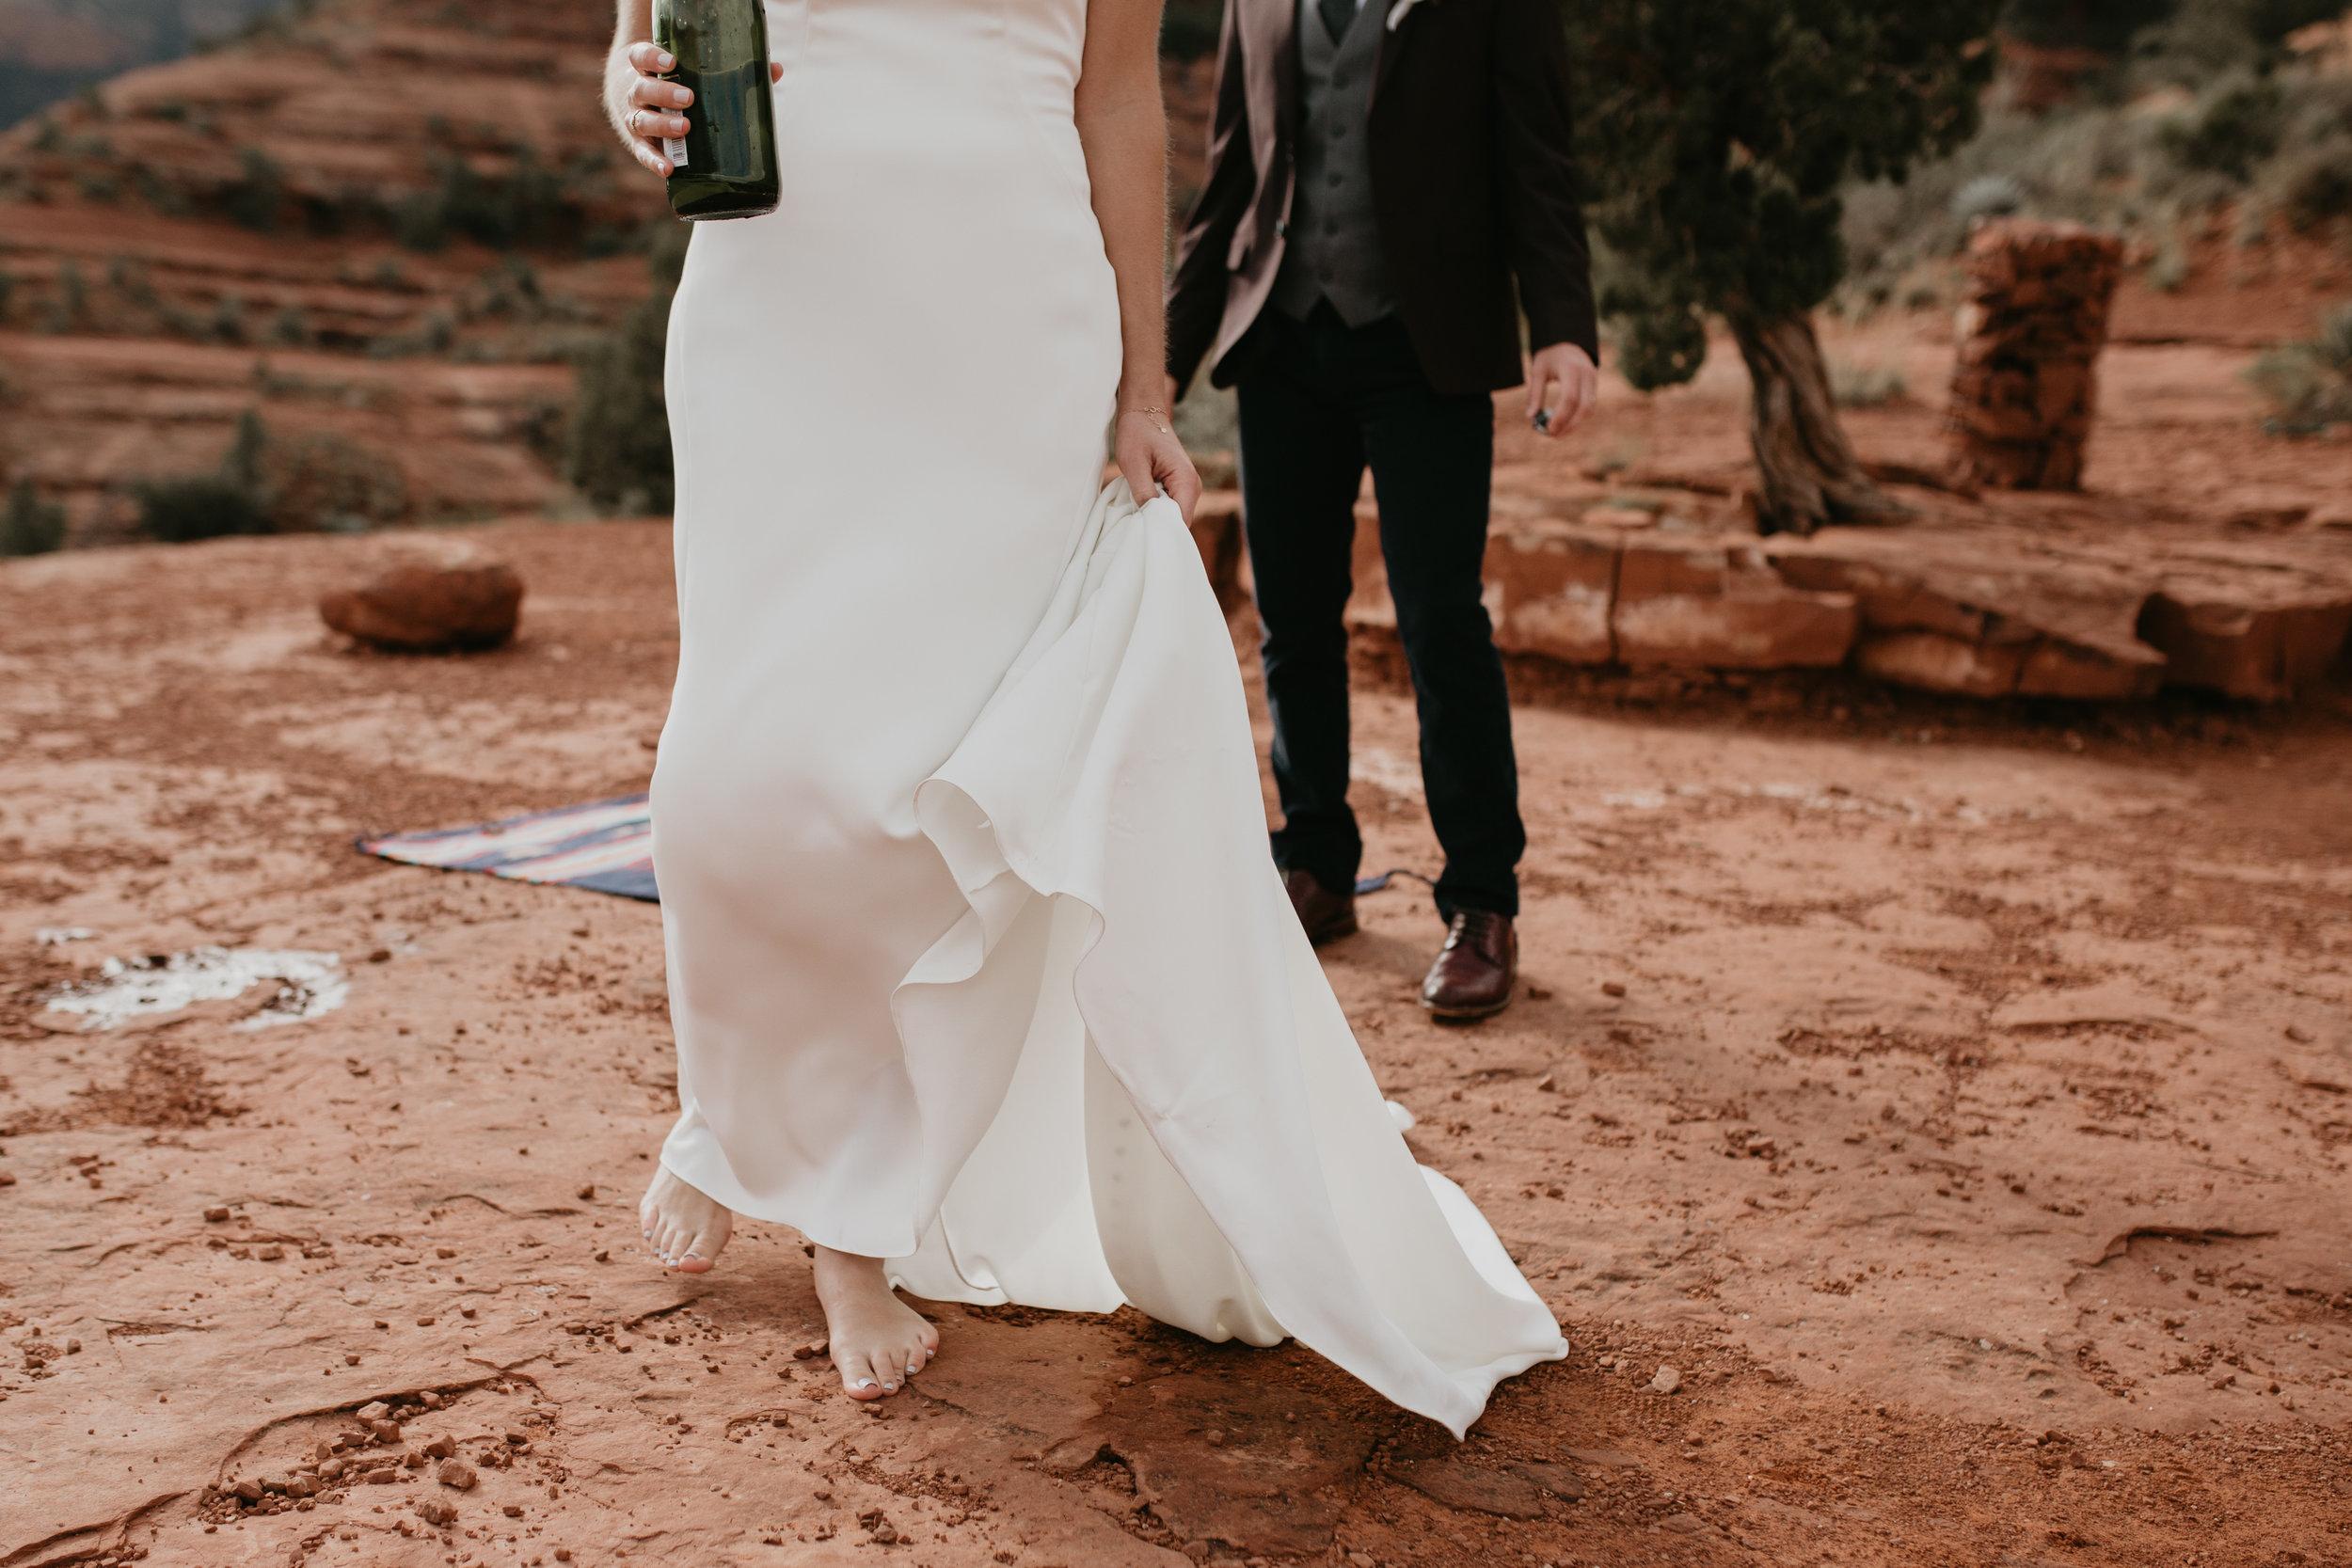 nicole-daacke-photography-sedona-arizona-destination-elopement-wedding-photographer-catherdral-rock-hiking-elopement-sedona-river-elopement-photos-desert-rock-wedding-photographer-laid-back-spontaneous-elopement-90.jpg